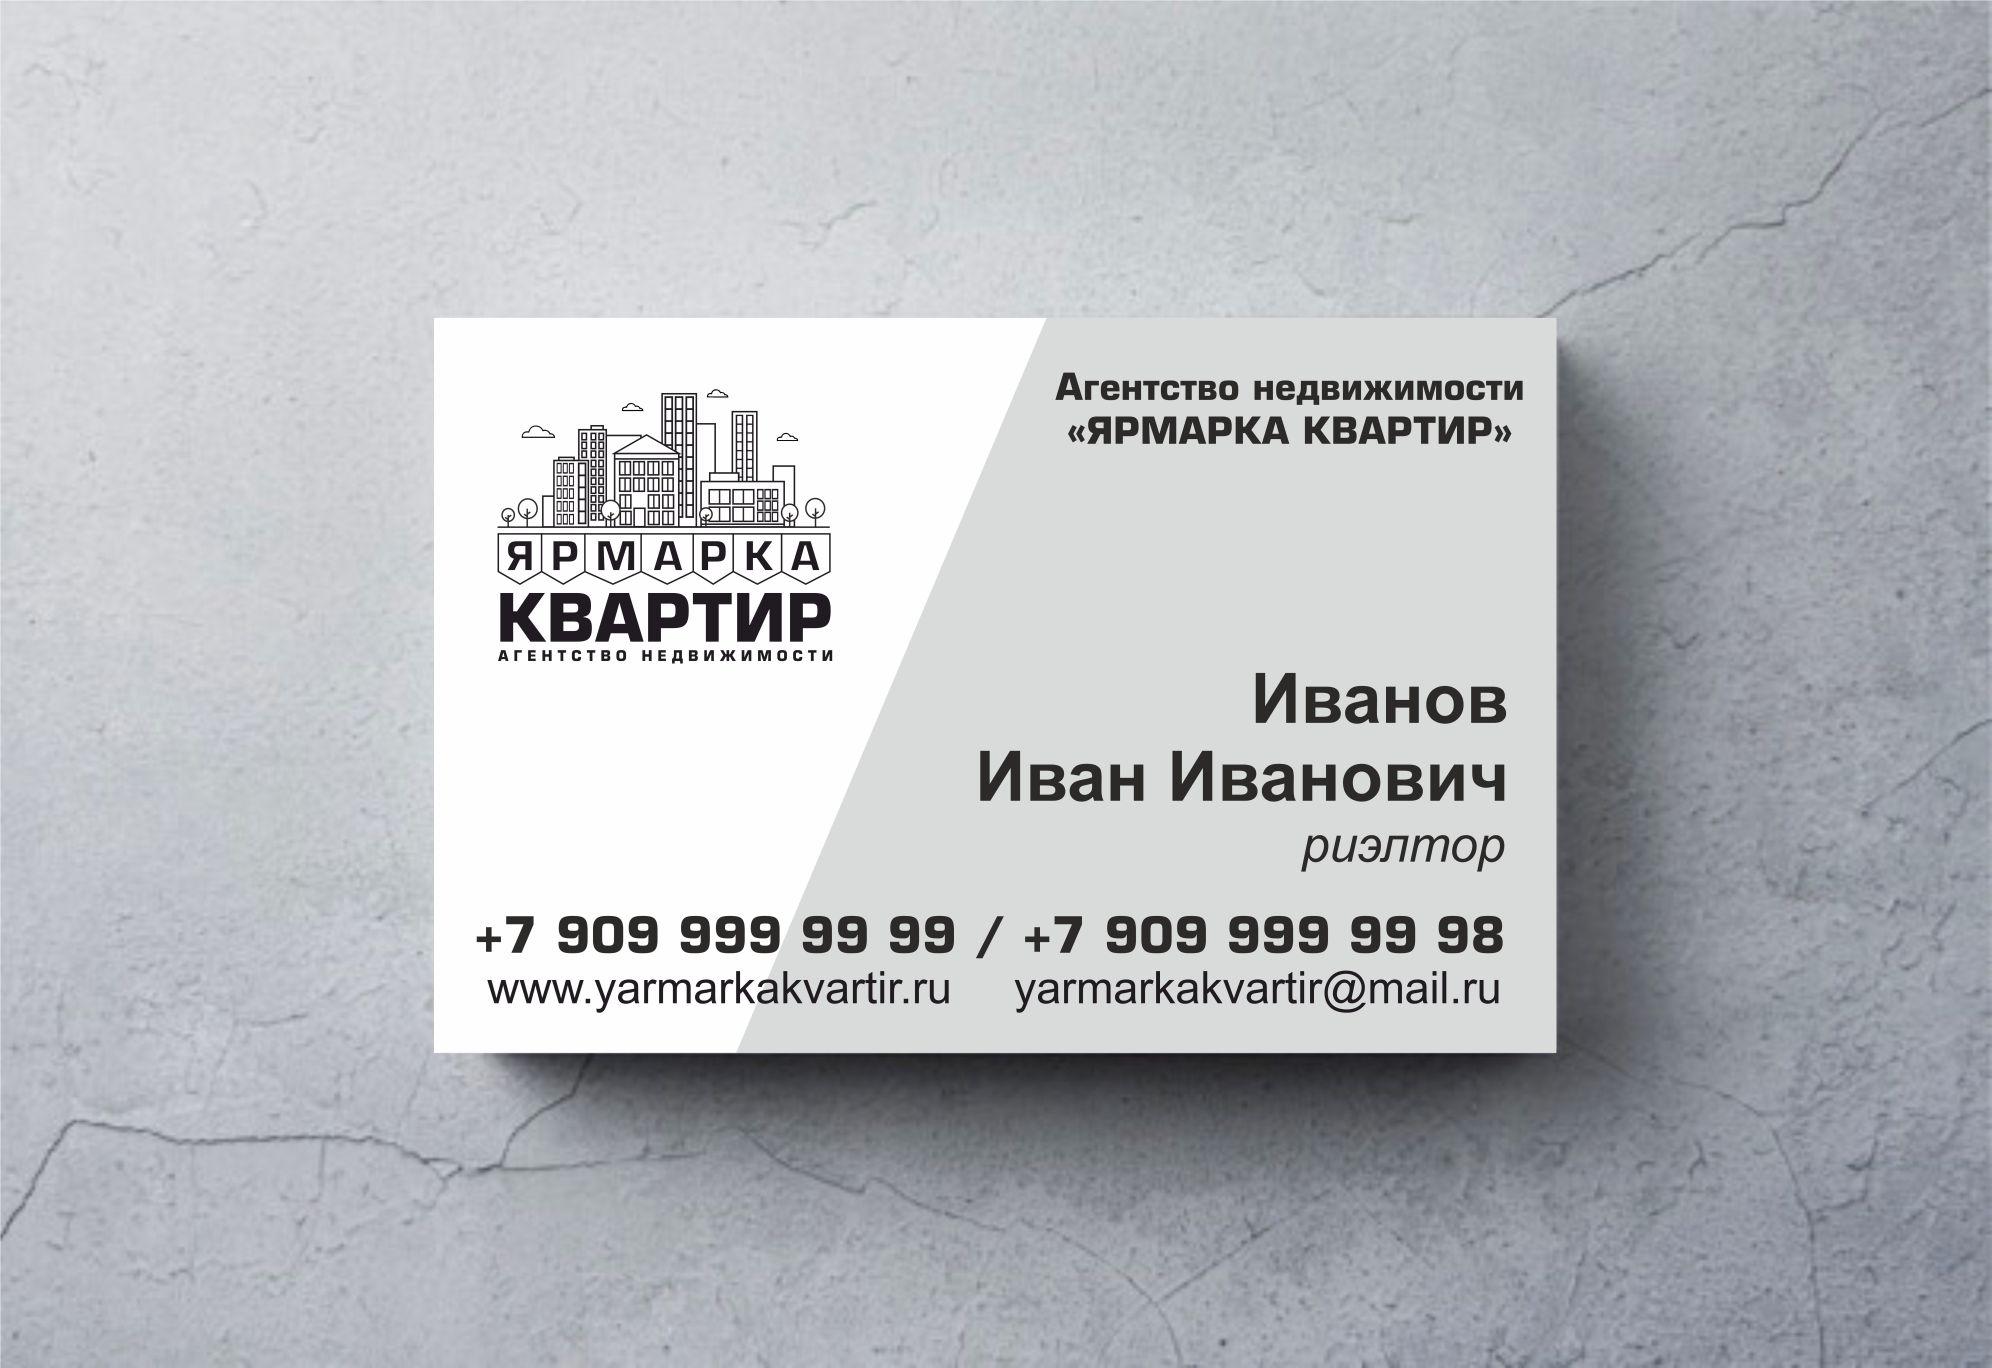 Создание логотипа, с вариантами для визитки и листовки фото f_054600858caa6c7b.jpg